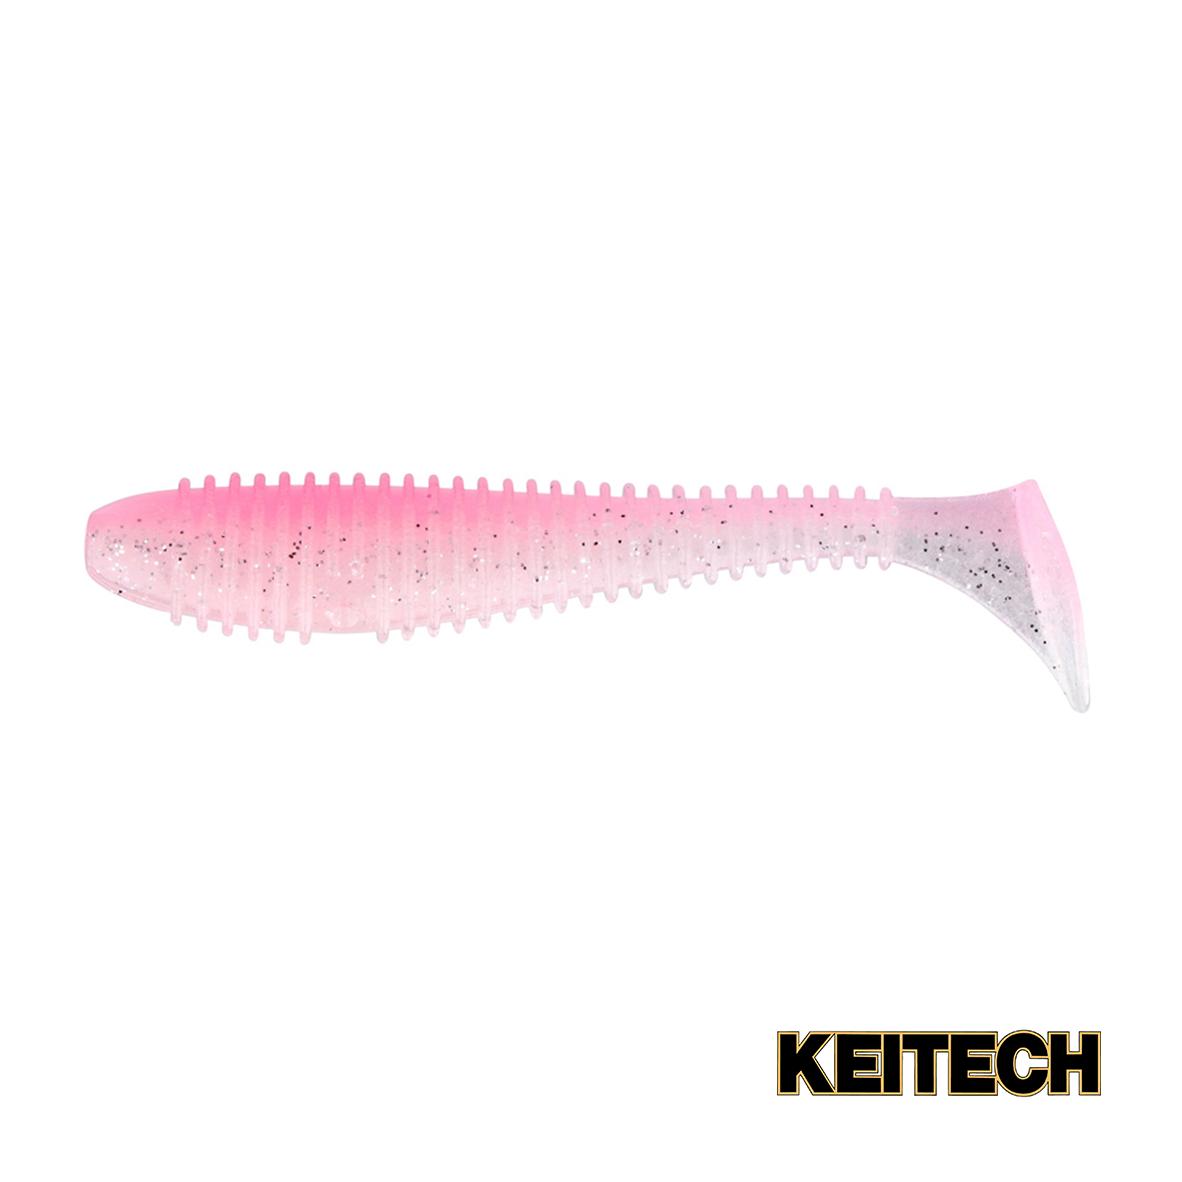 "Силикон Keitech Swing Impact FAT 4.3"" (5 шт/упак) ц:ea#10 pink si"